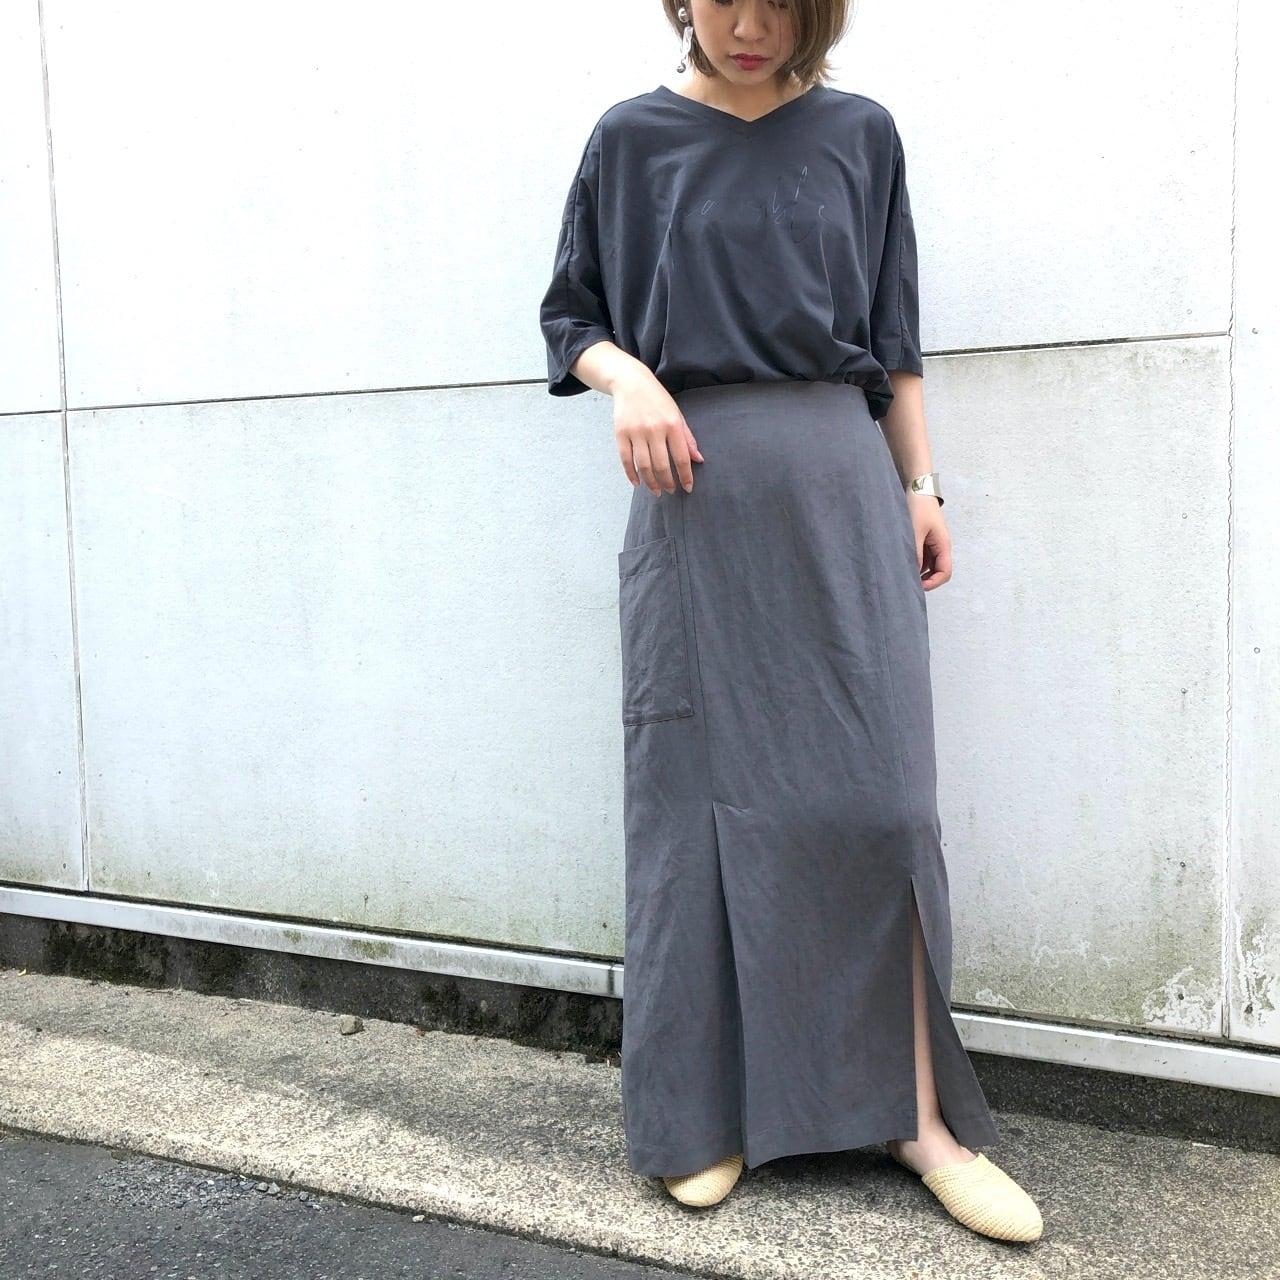 【 CHIGNONSTAR 】- 2201-375 - タックスリットスカート